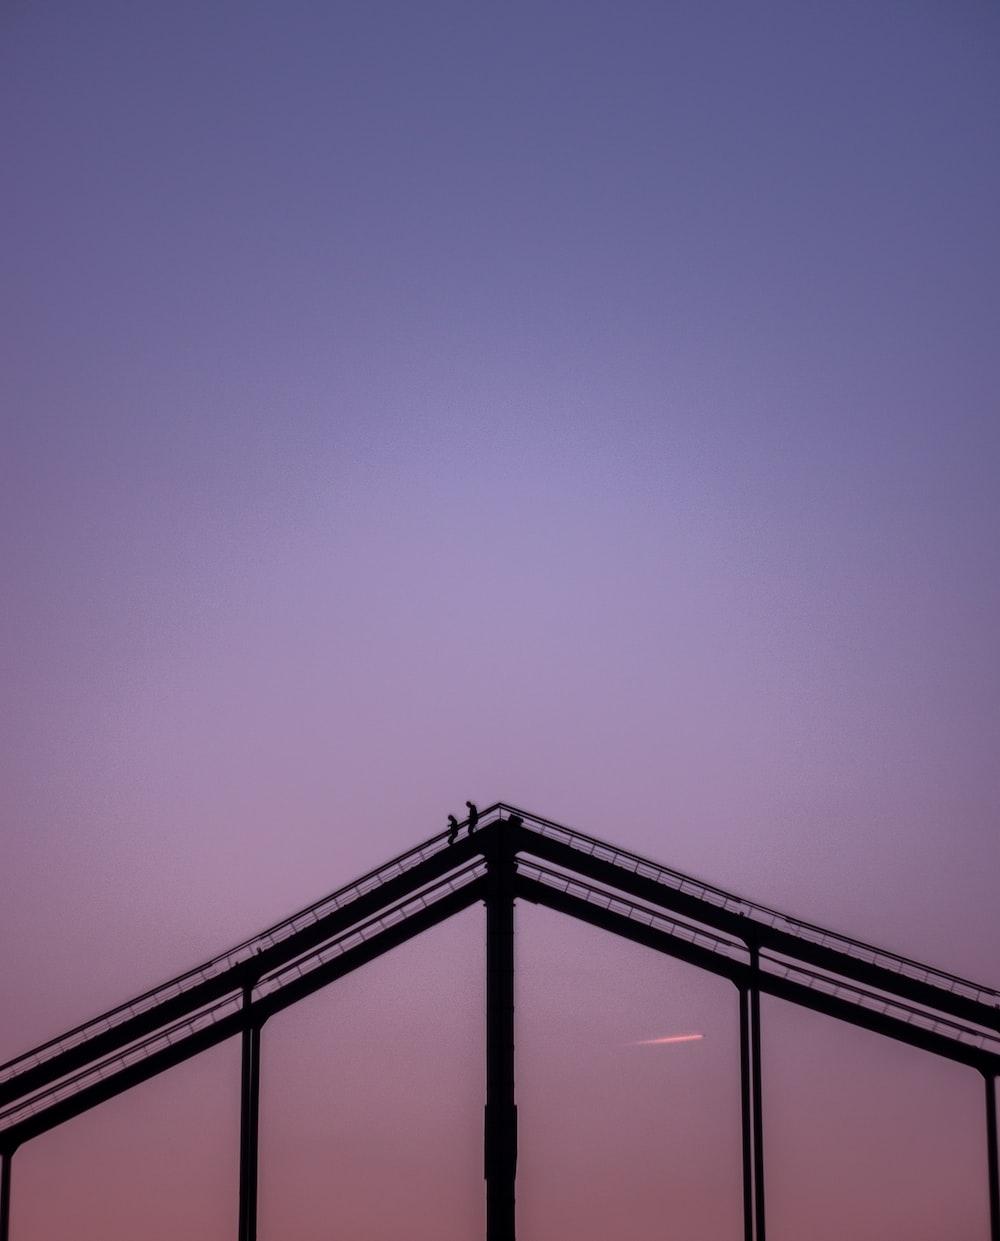 black framed balcony close-up photography